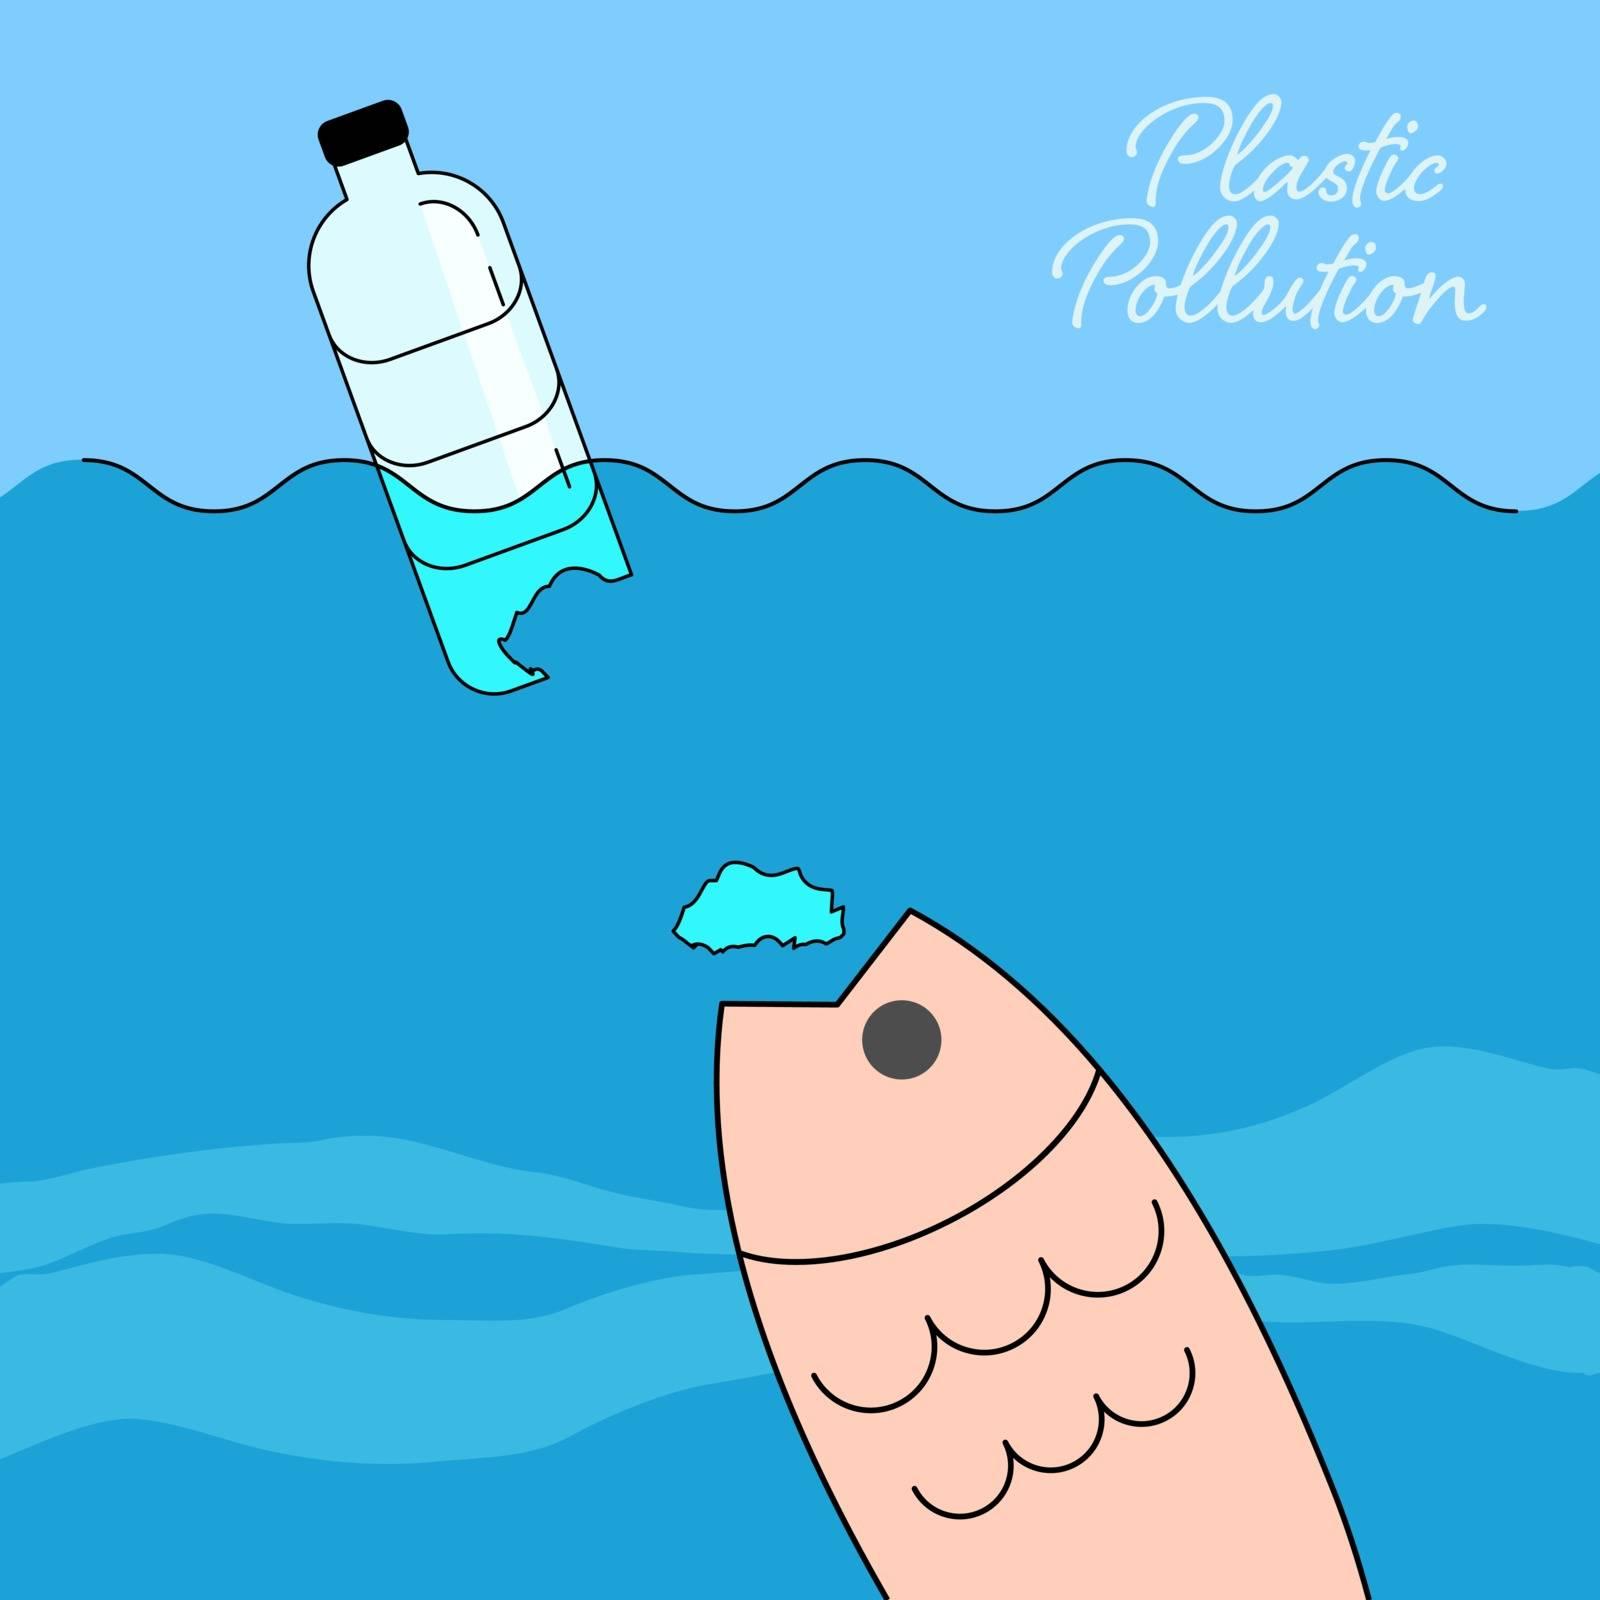 Plastic bottle fragments causing pollution in the ocean. Ocean plastic pollution concept. Vector illustration.